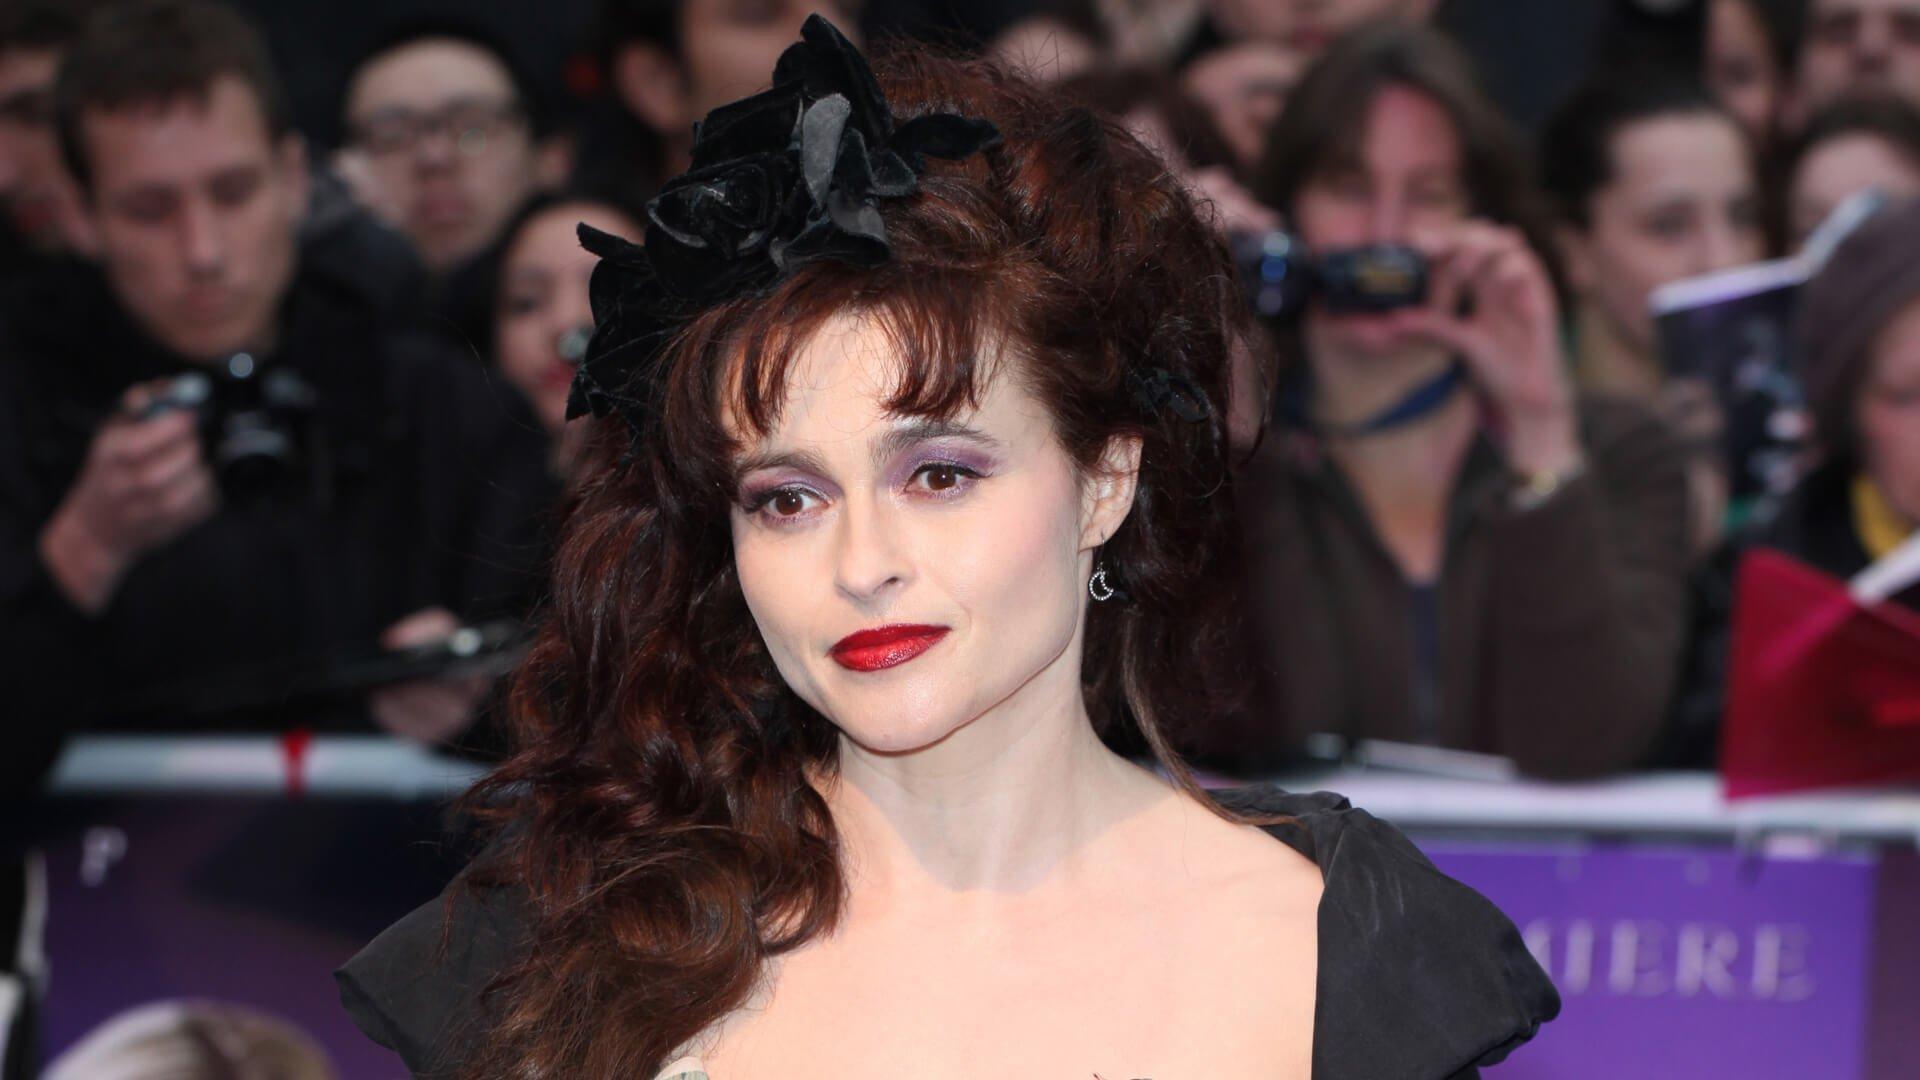 What Is Helena Bonham Carter's Net Worth?